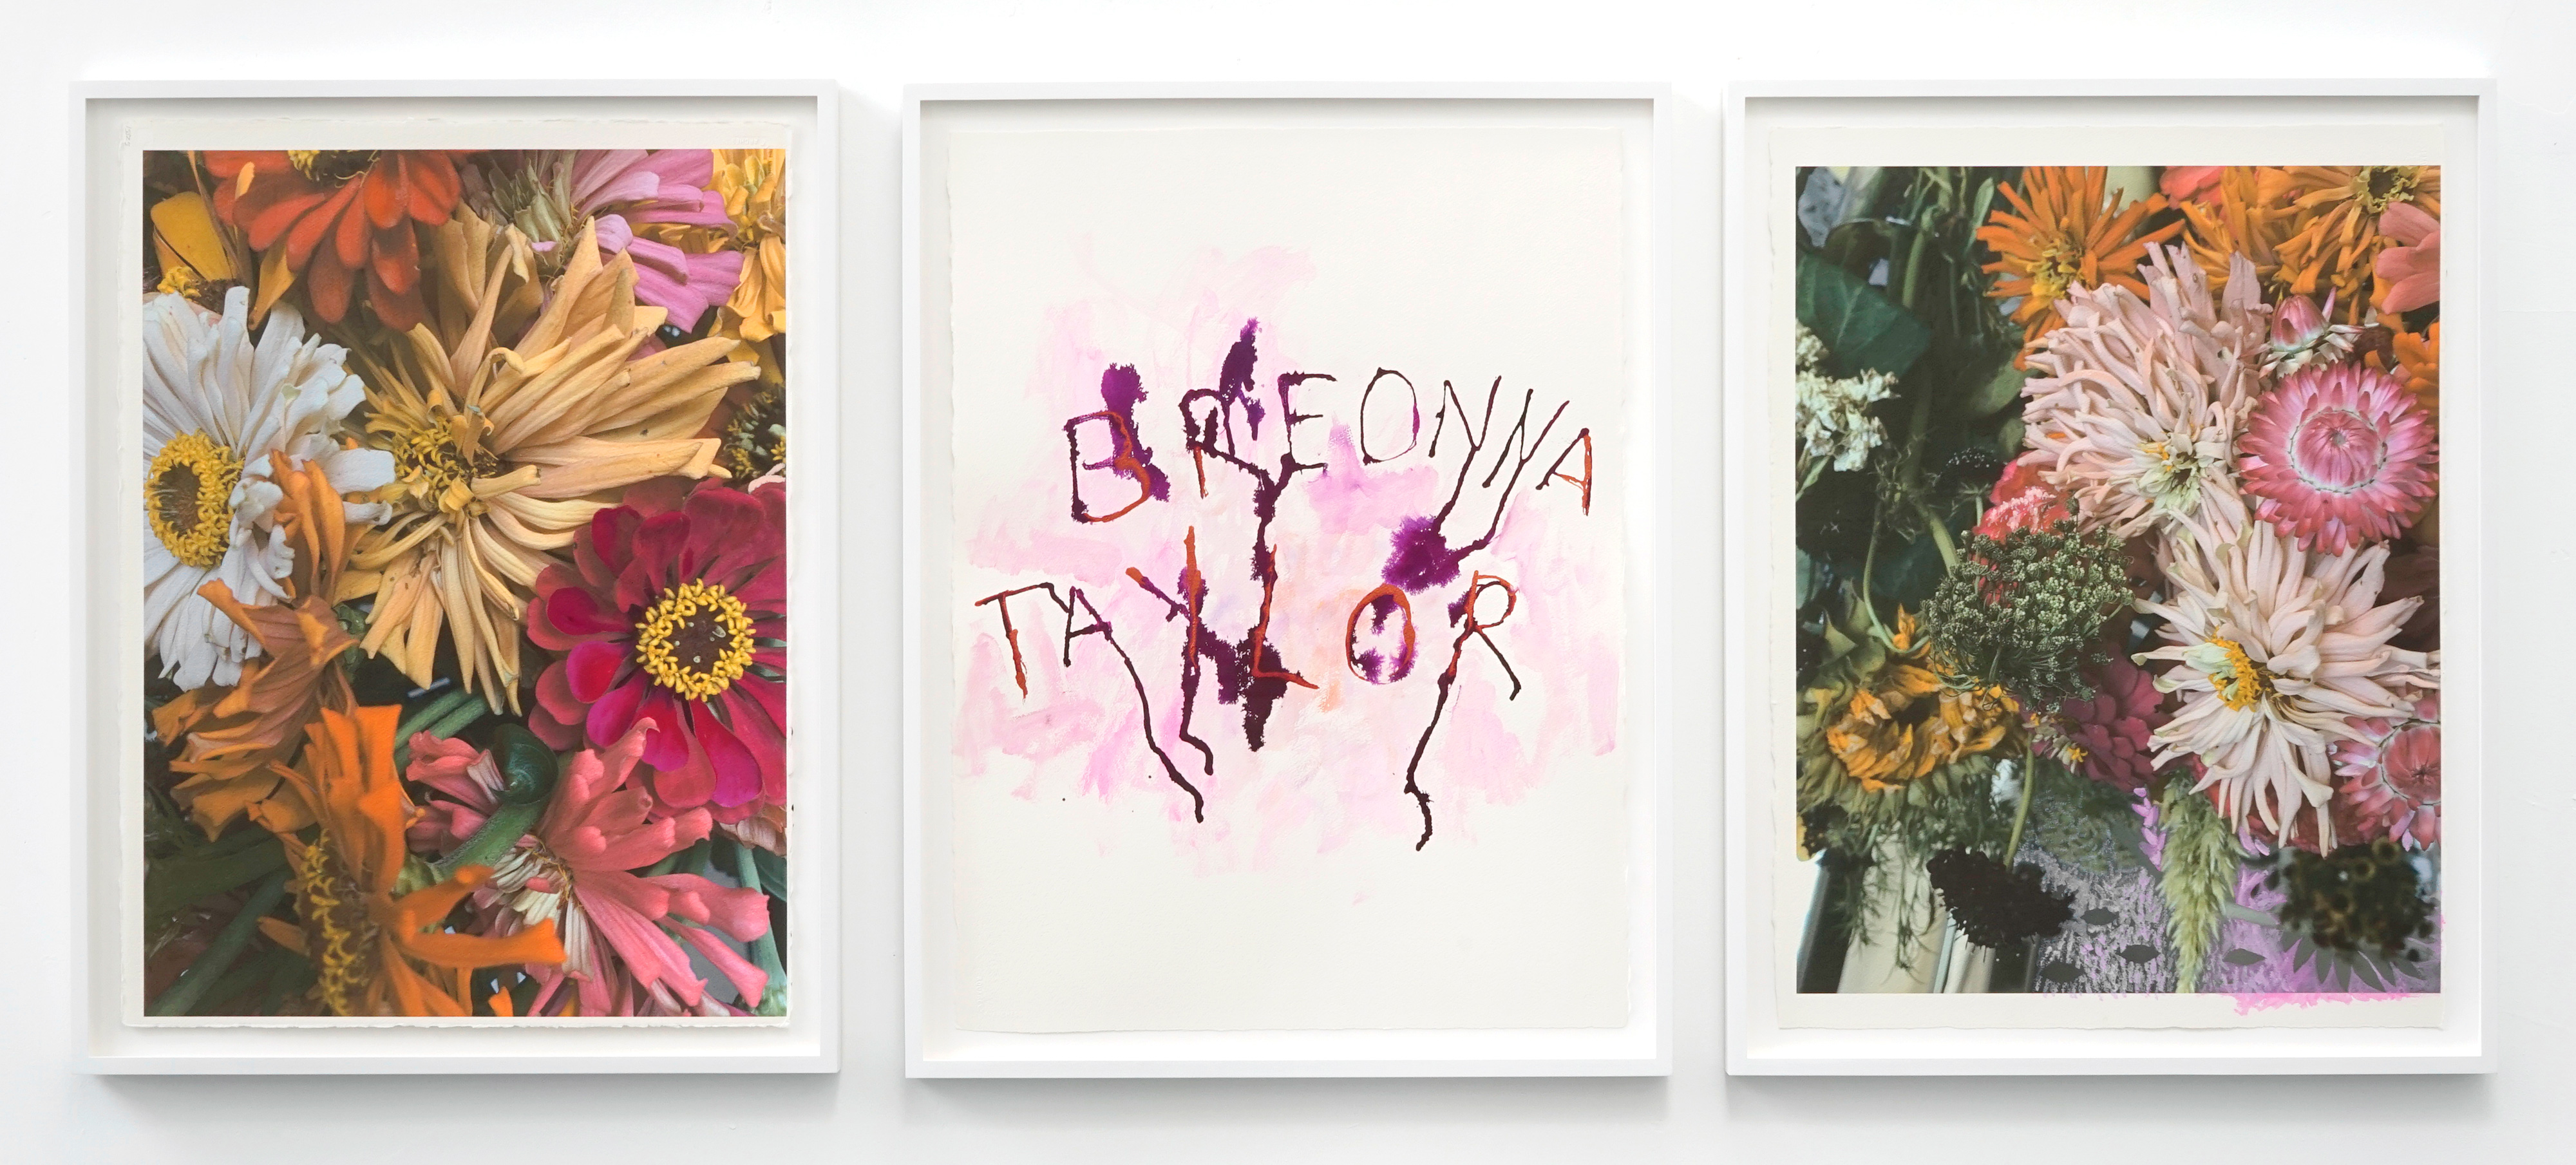 Galerie Barbara Thumm \ New Viewings #25 \ New Viewings #25